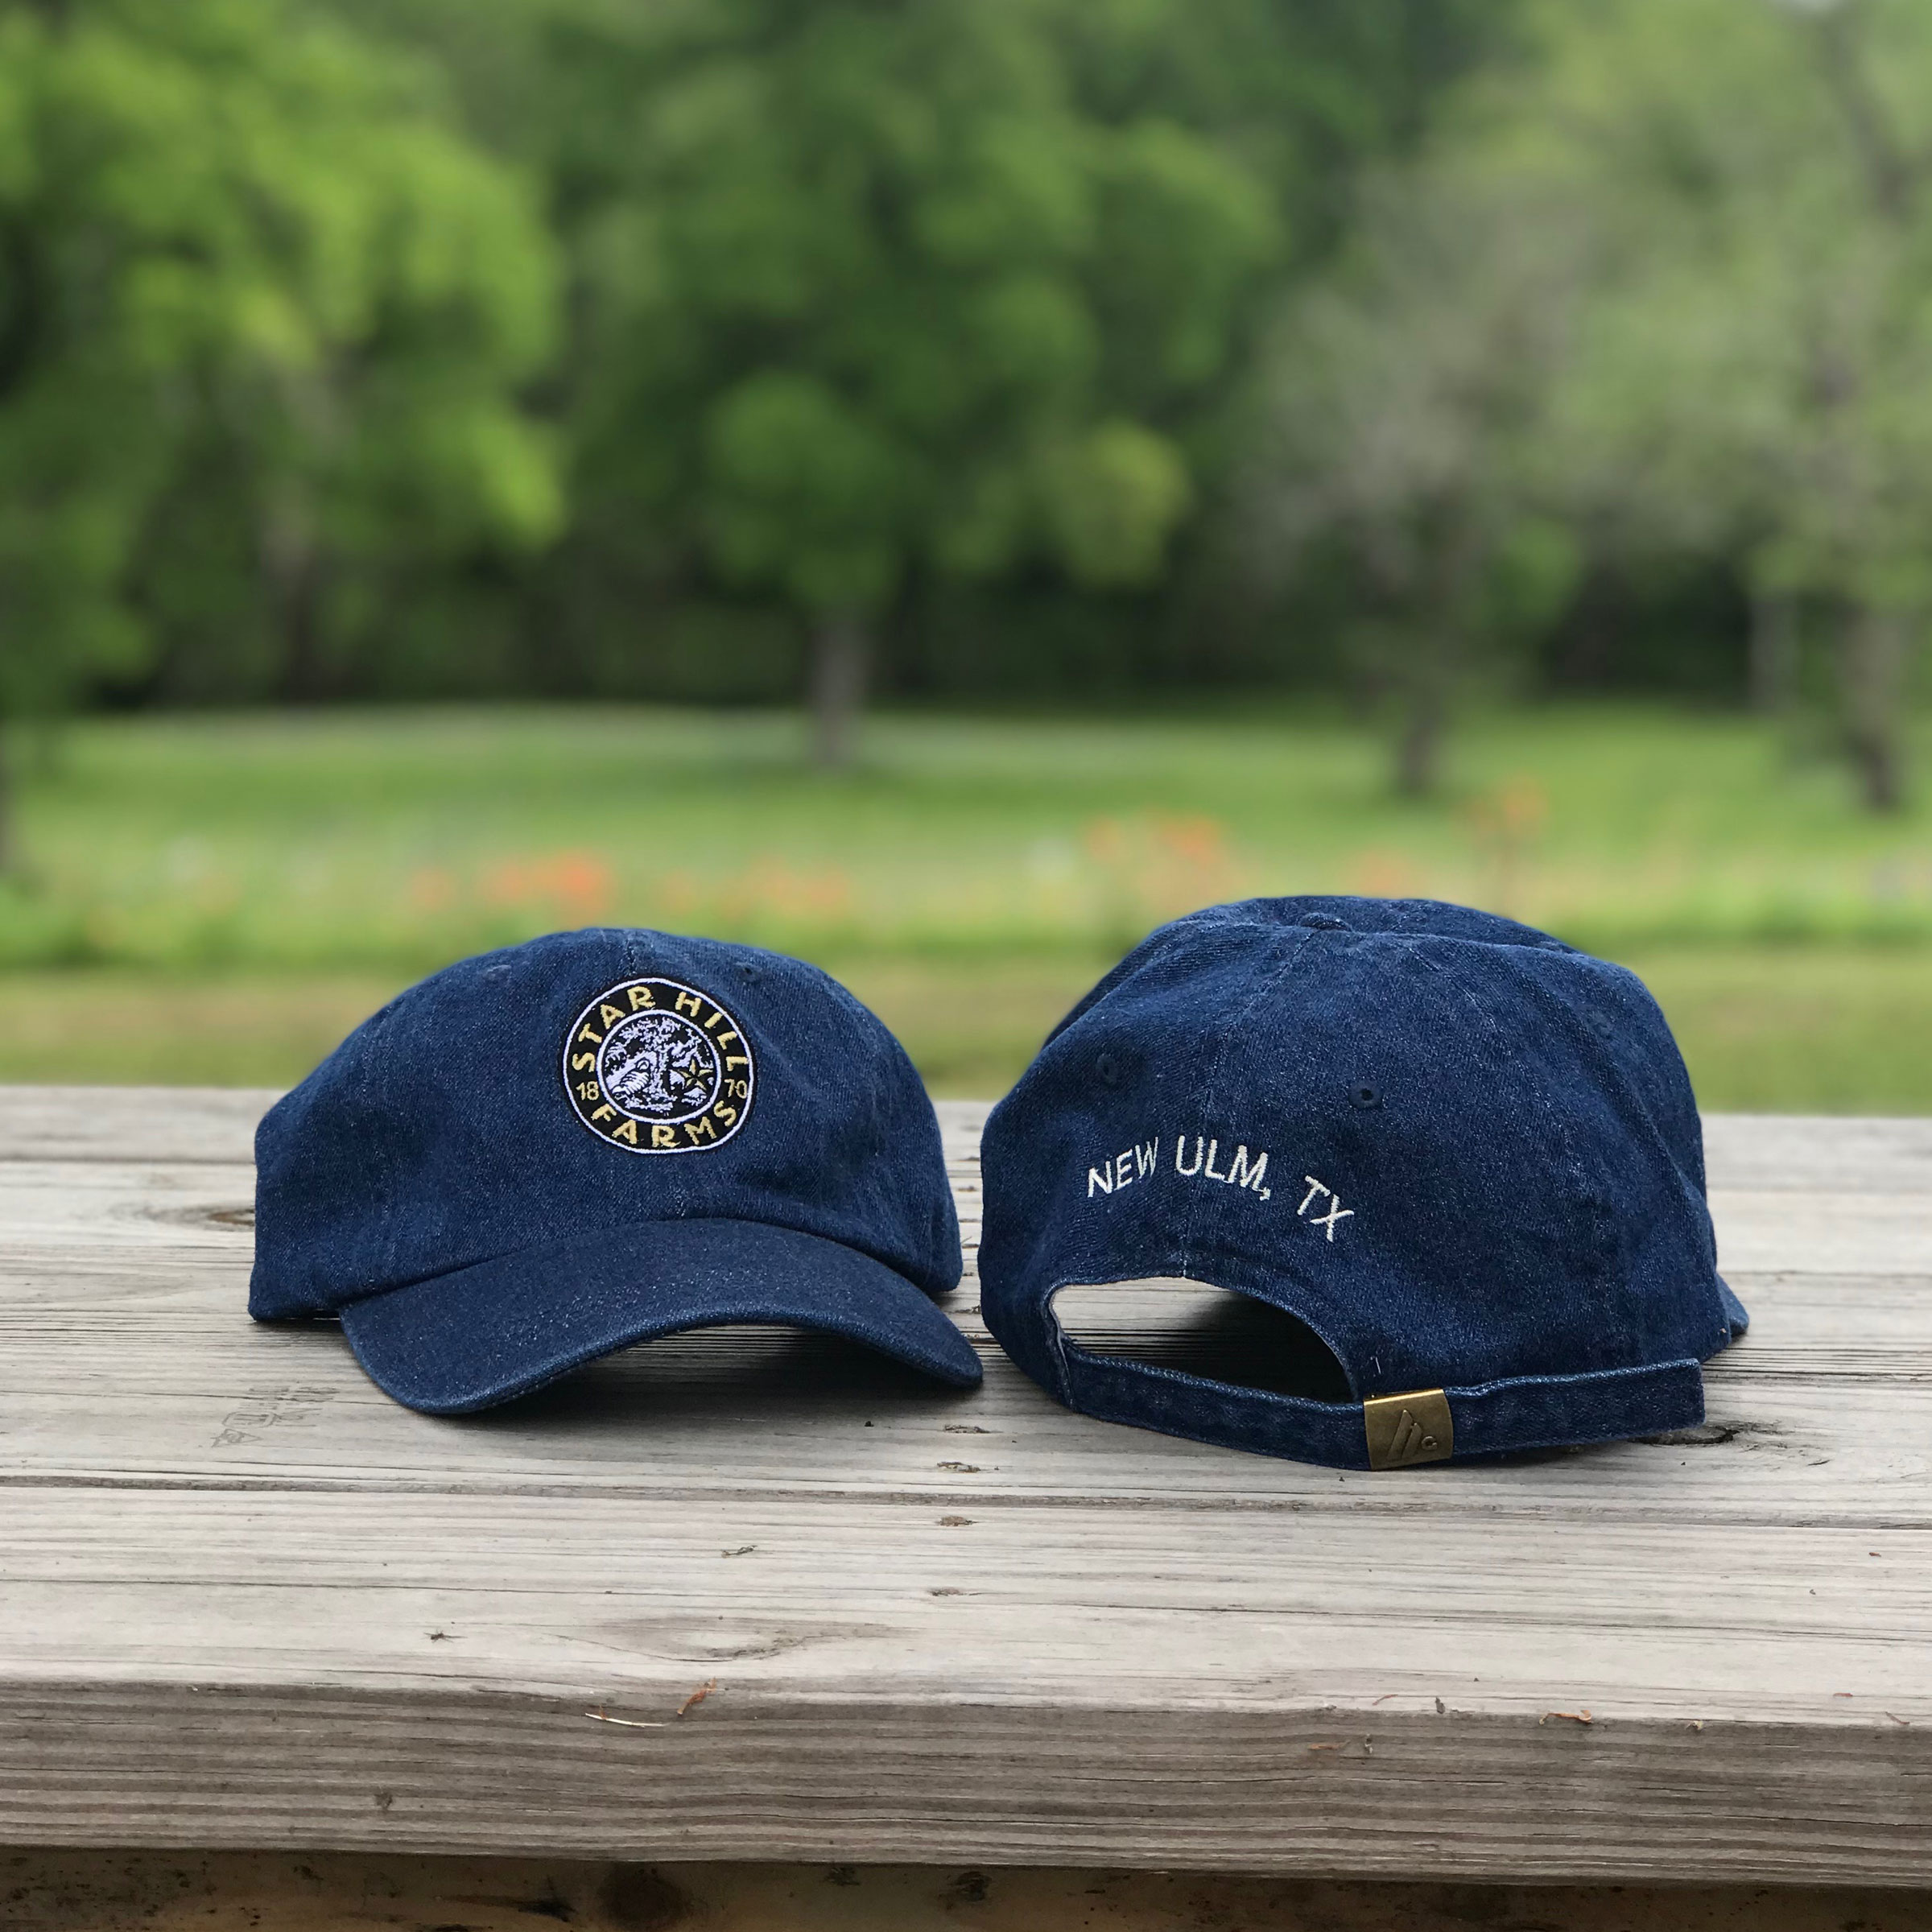 StarHill Vintage Hat Collection